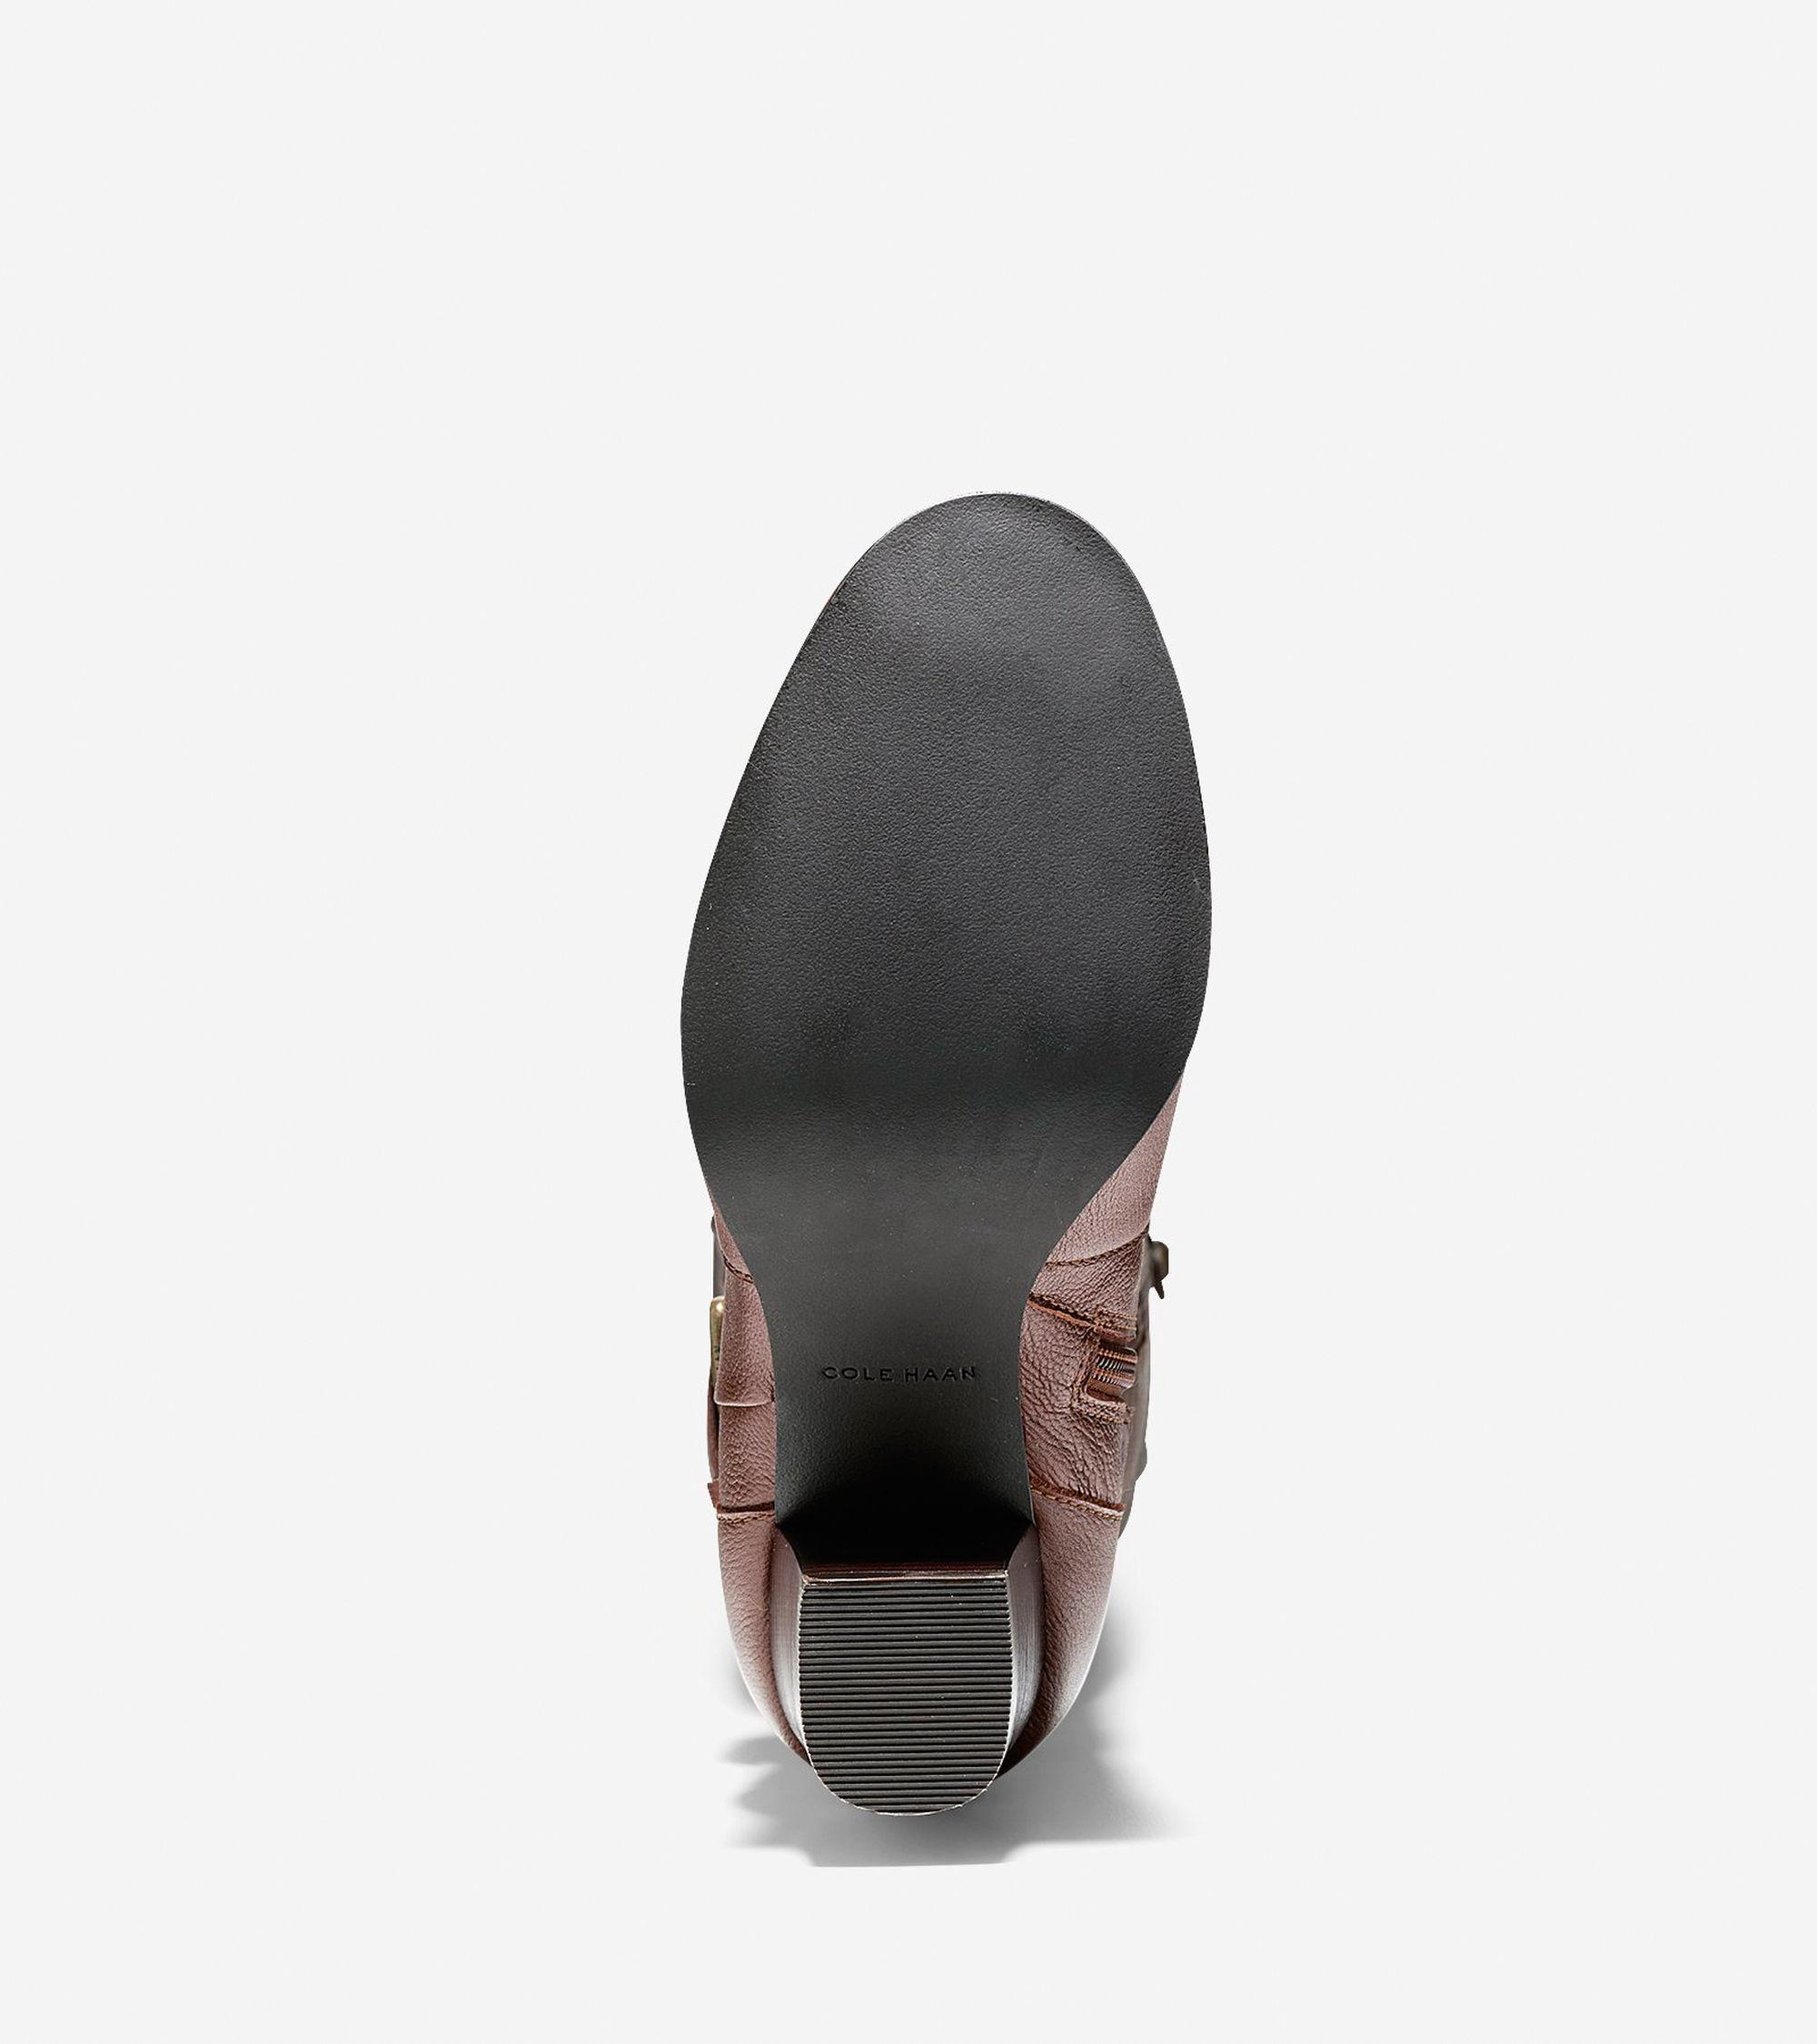 Clarks Shoes Hinckley